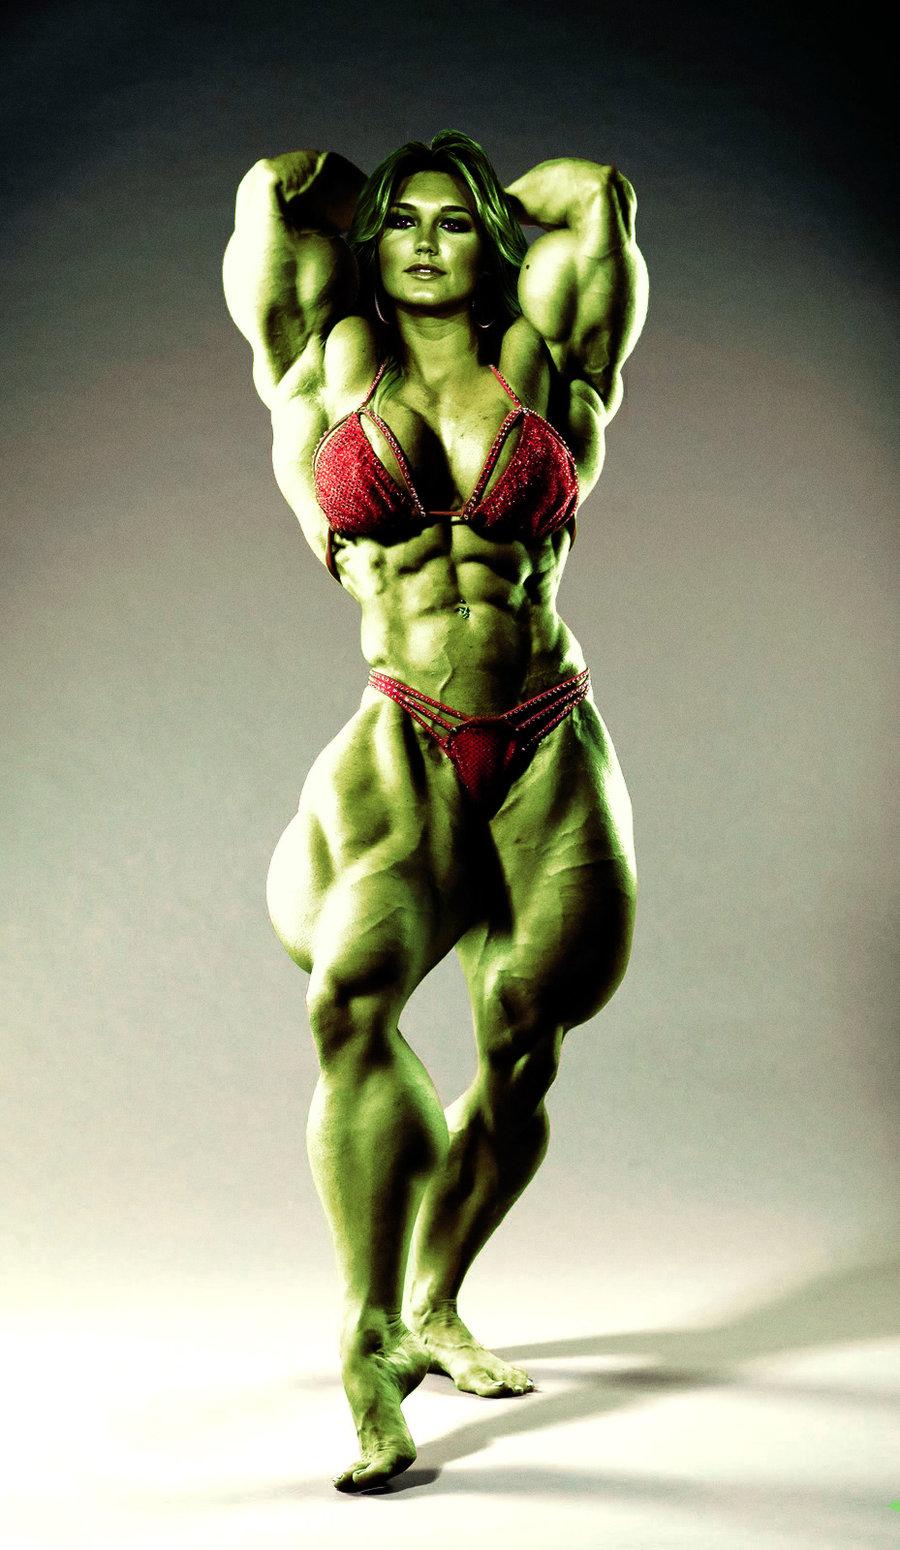 brooke_hogan_as_she_hulk_by_catdigitalart-d4zdxmc.jpg